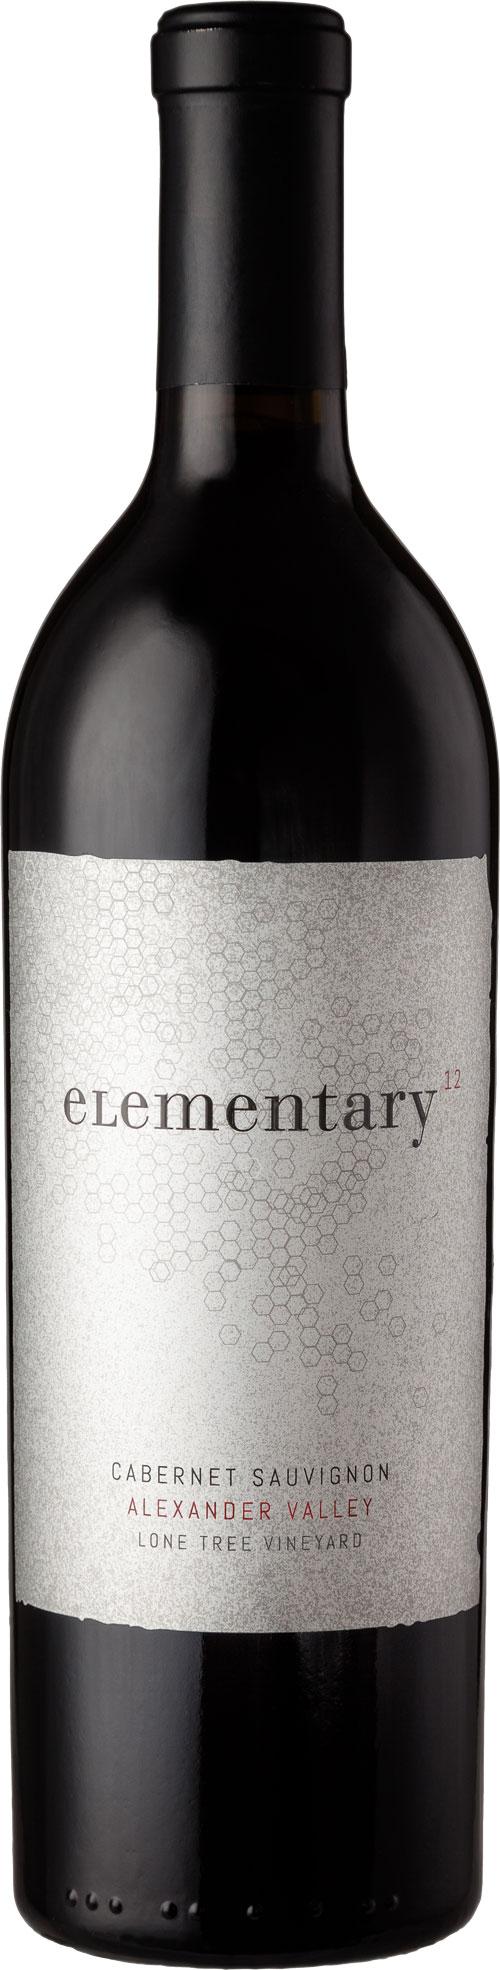 2015 Elementary by Nick Goldschmidt Alexander Valley Cabernet Sauvignon Yeoman Vineyard